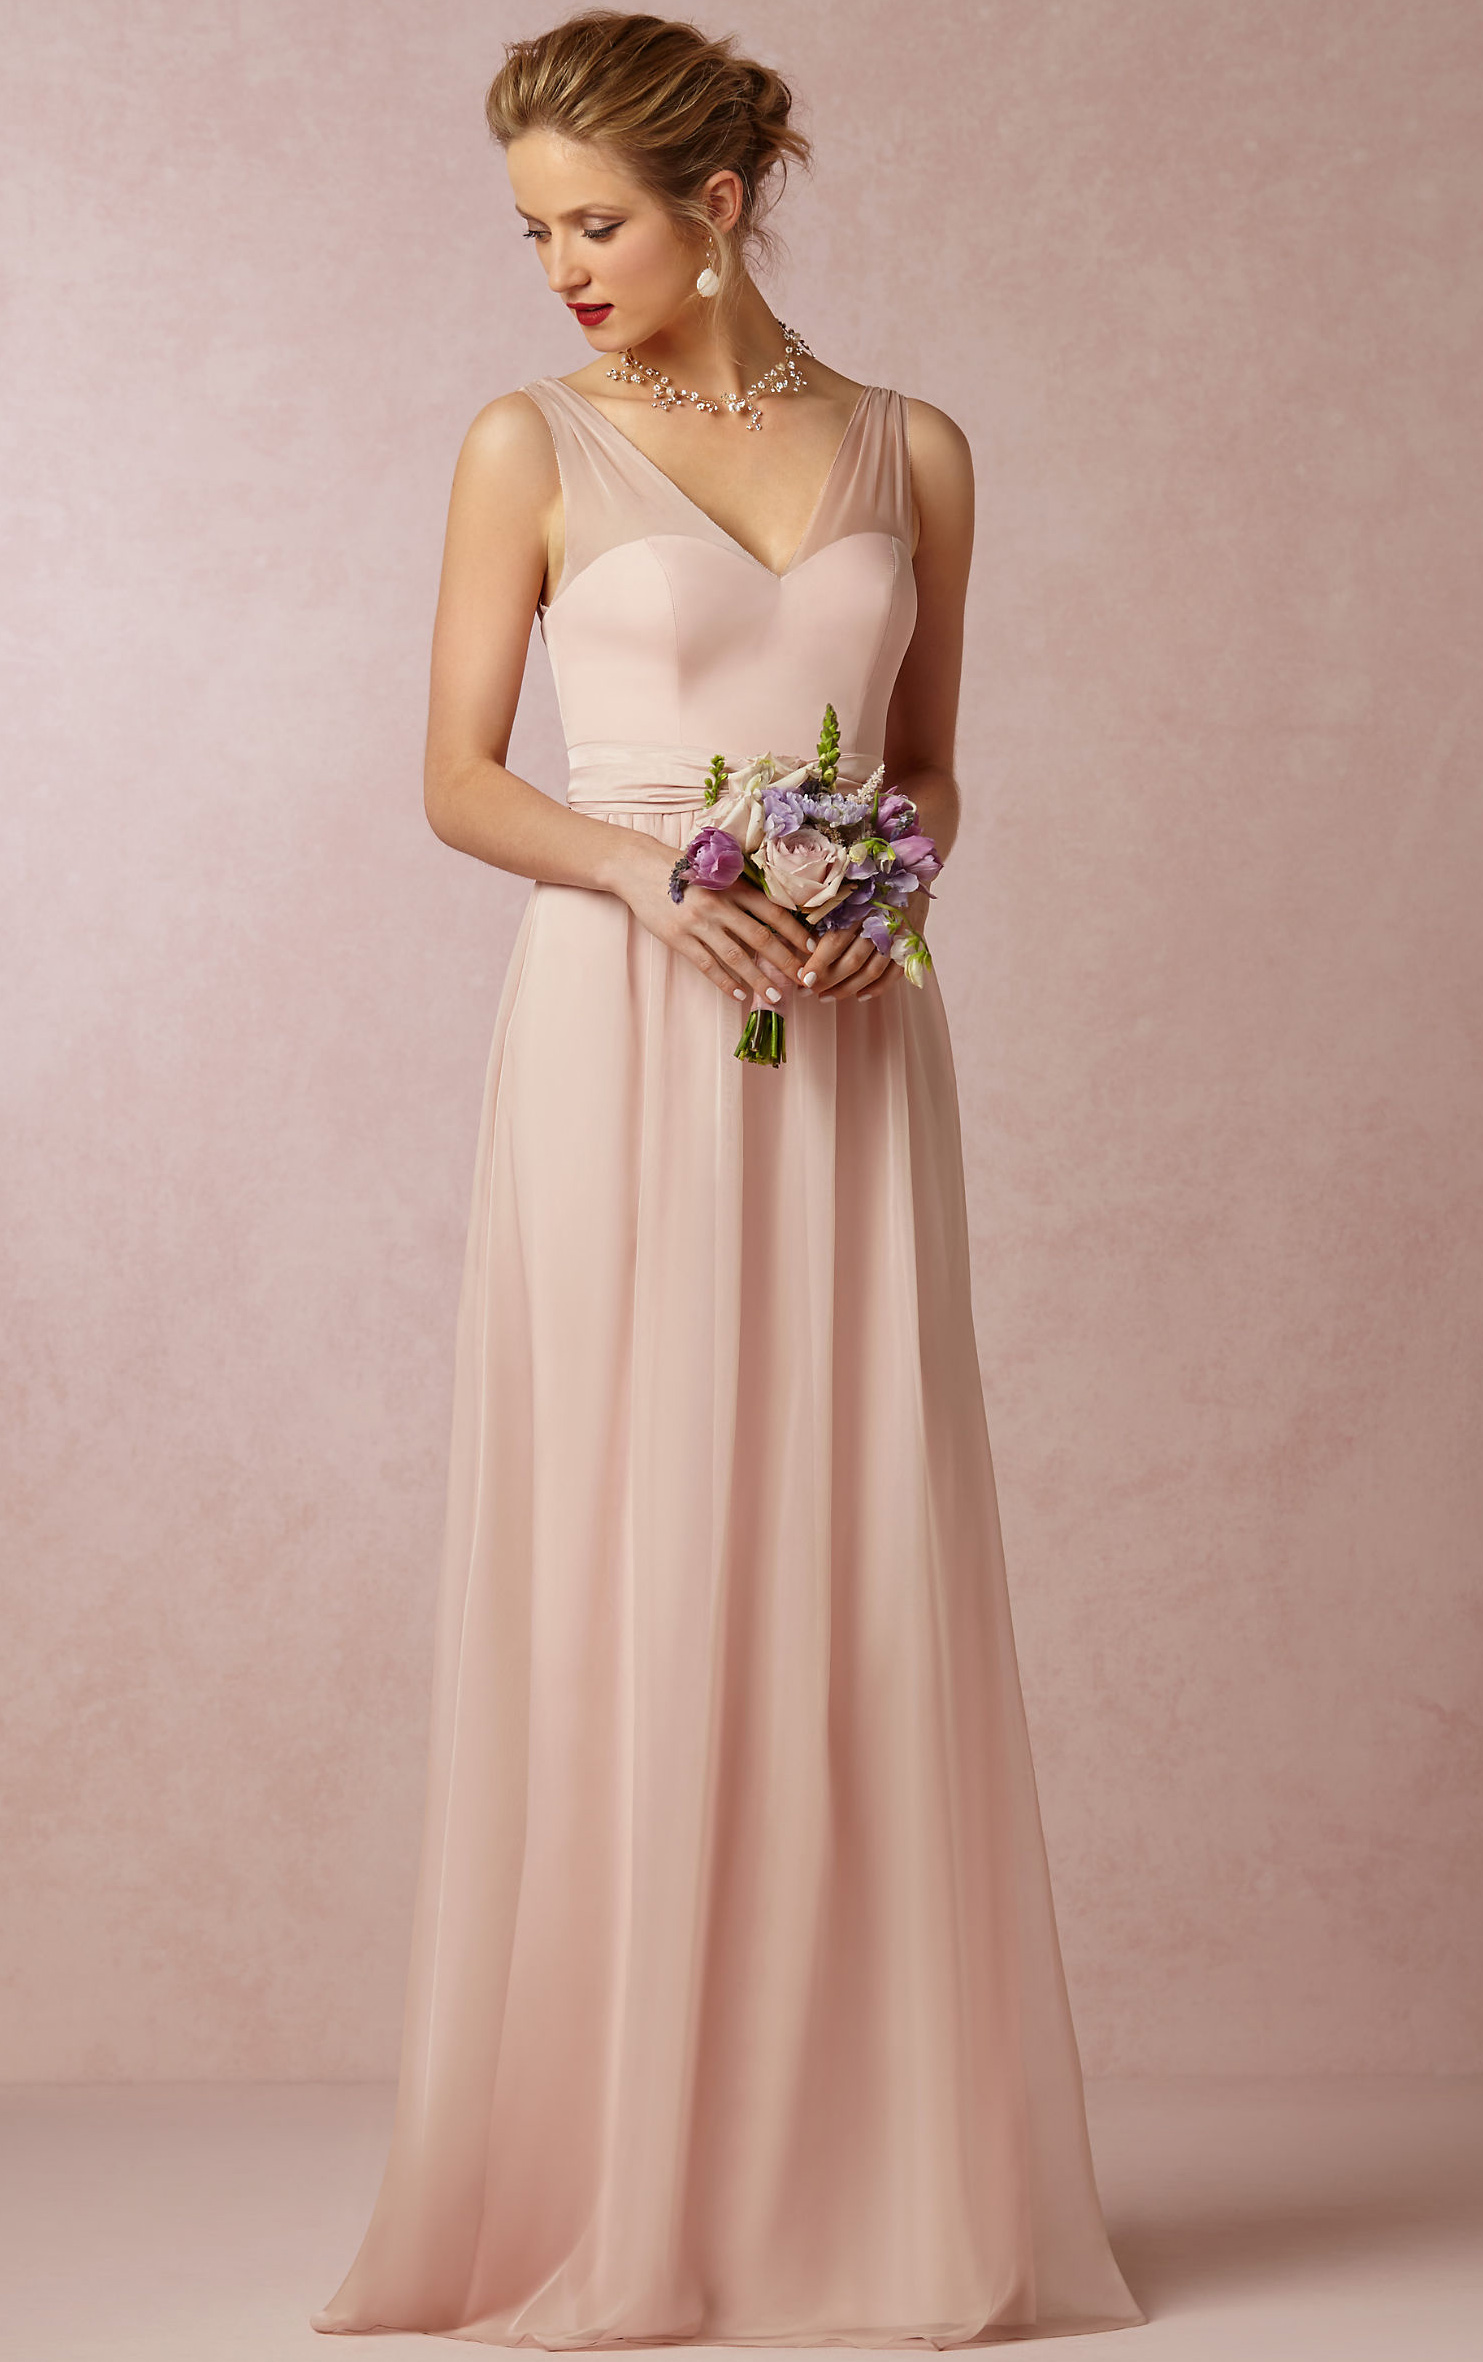 Pink bridesmaid dresses fashion life pink bridesmaid dresses hvimx9vq ombrellifo Choice Image